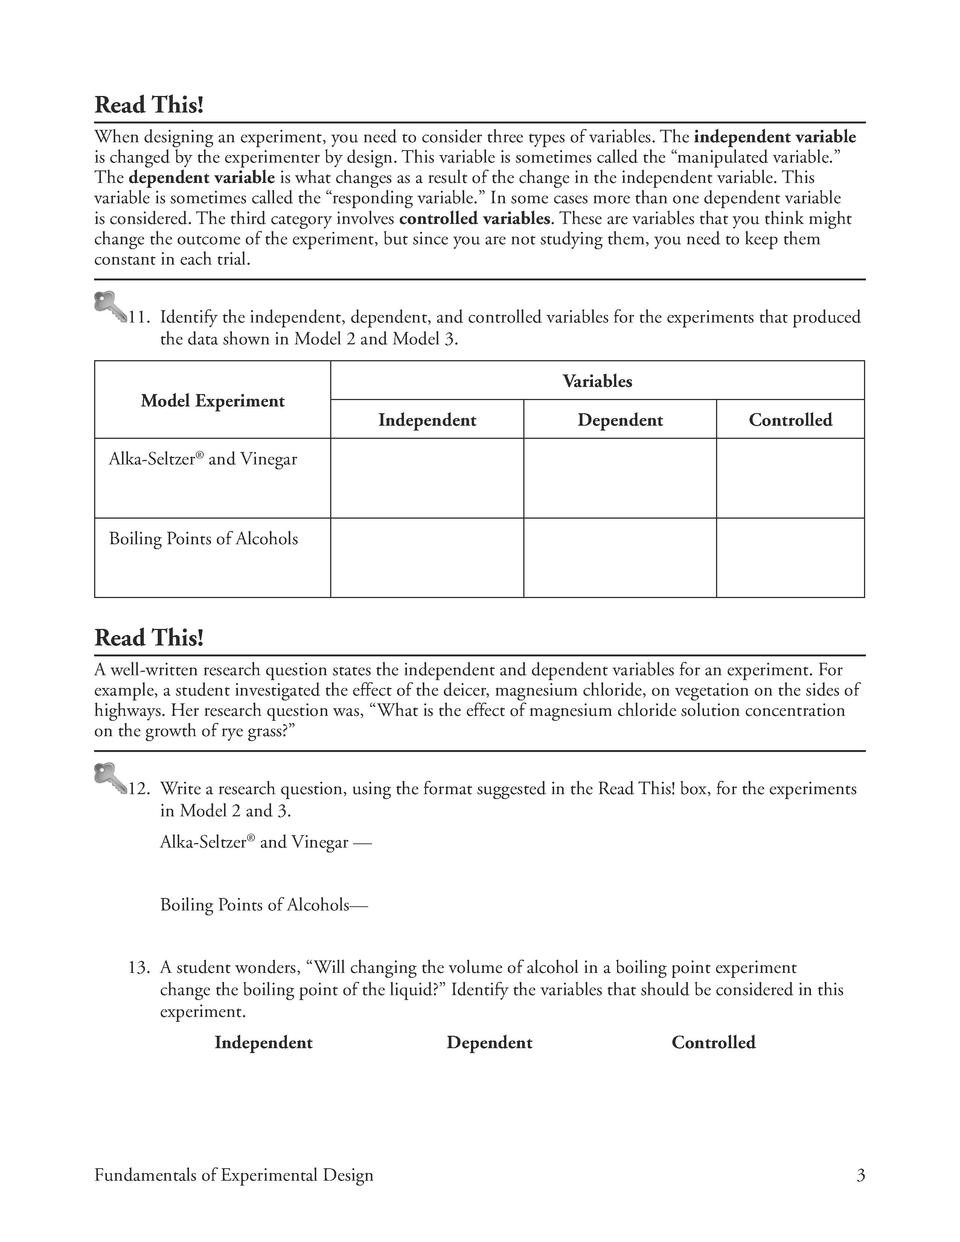 Experimental Design Worksheet Answers Experimental Design Worksheet